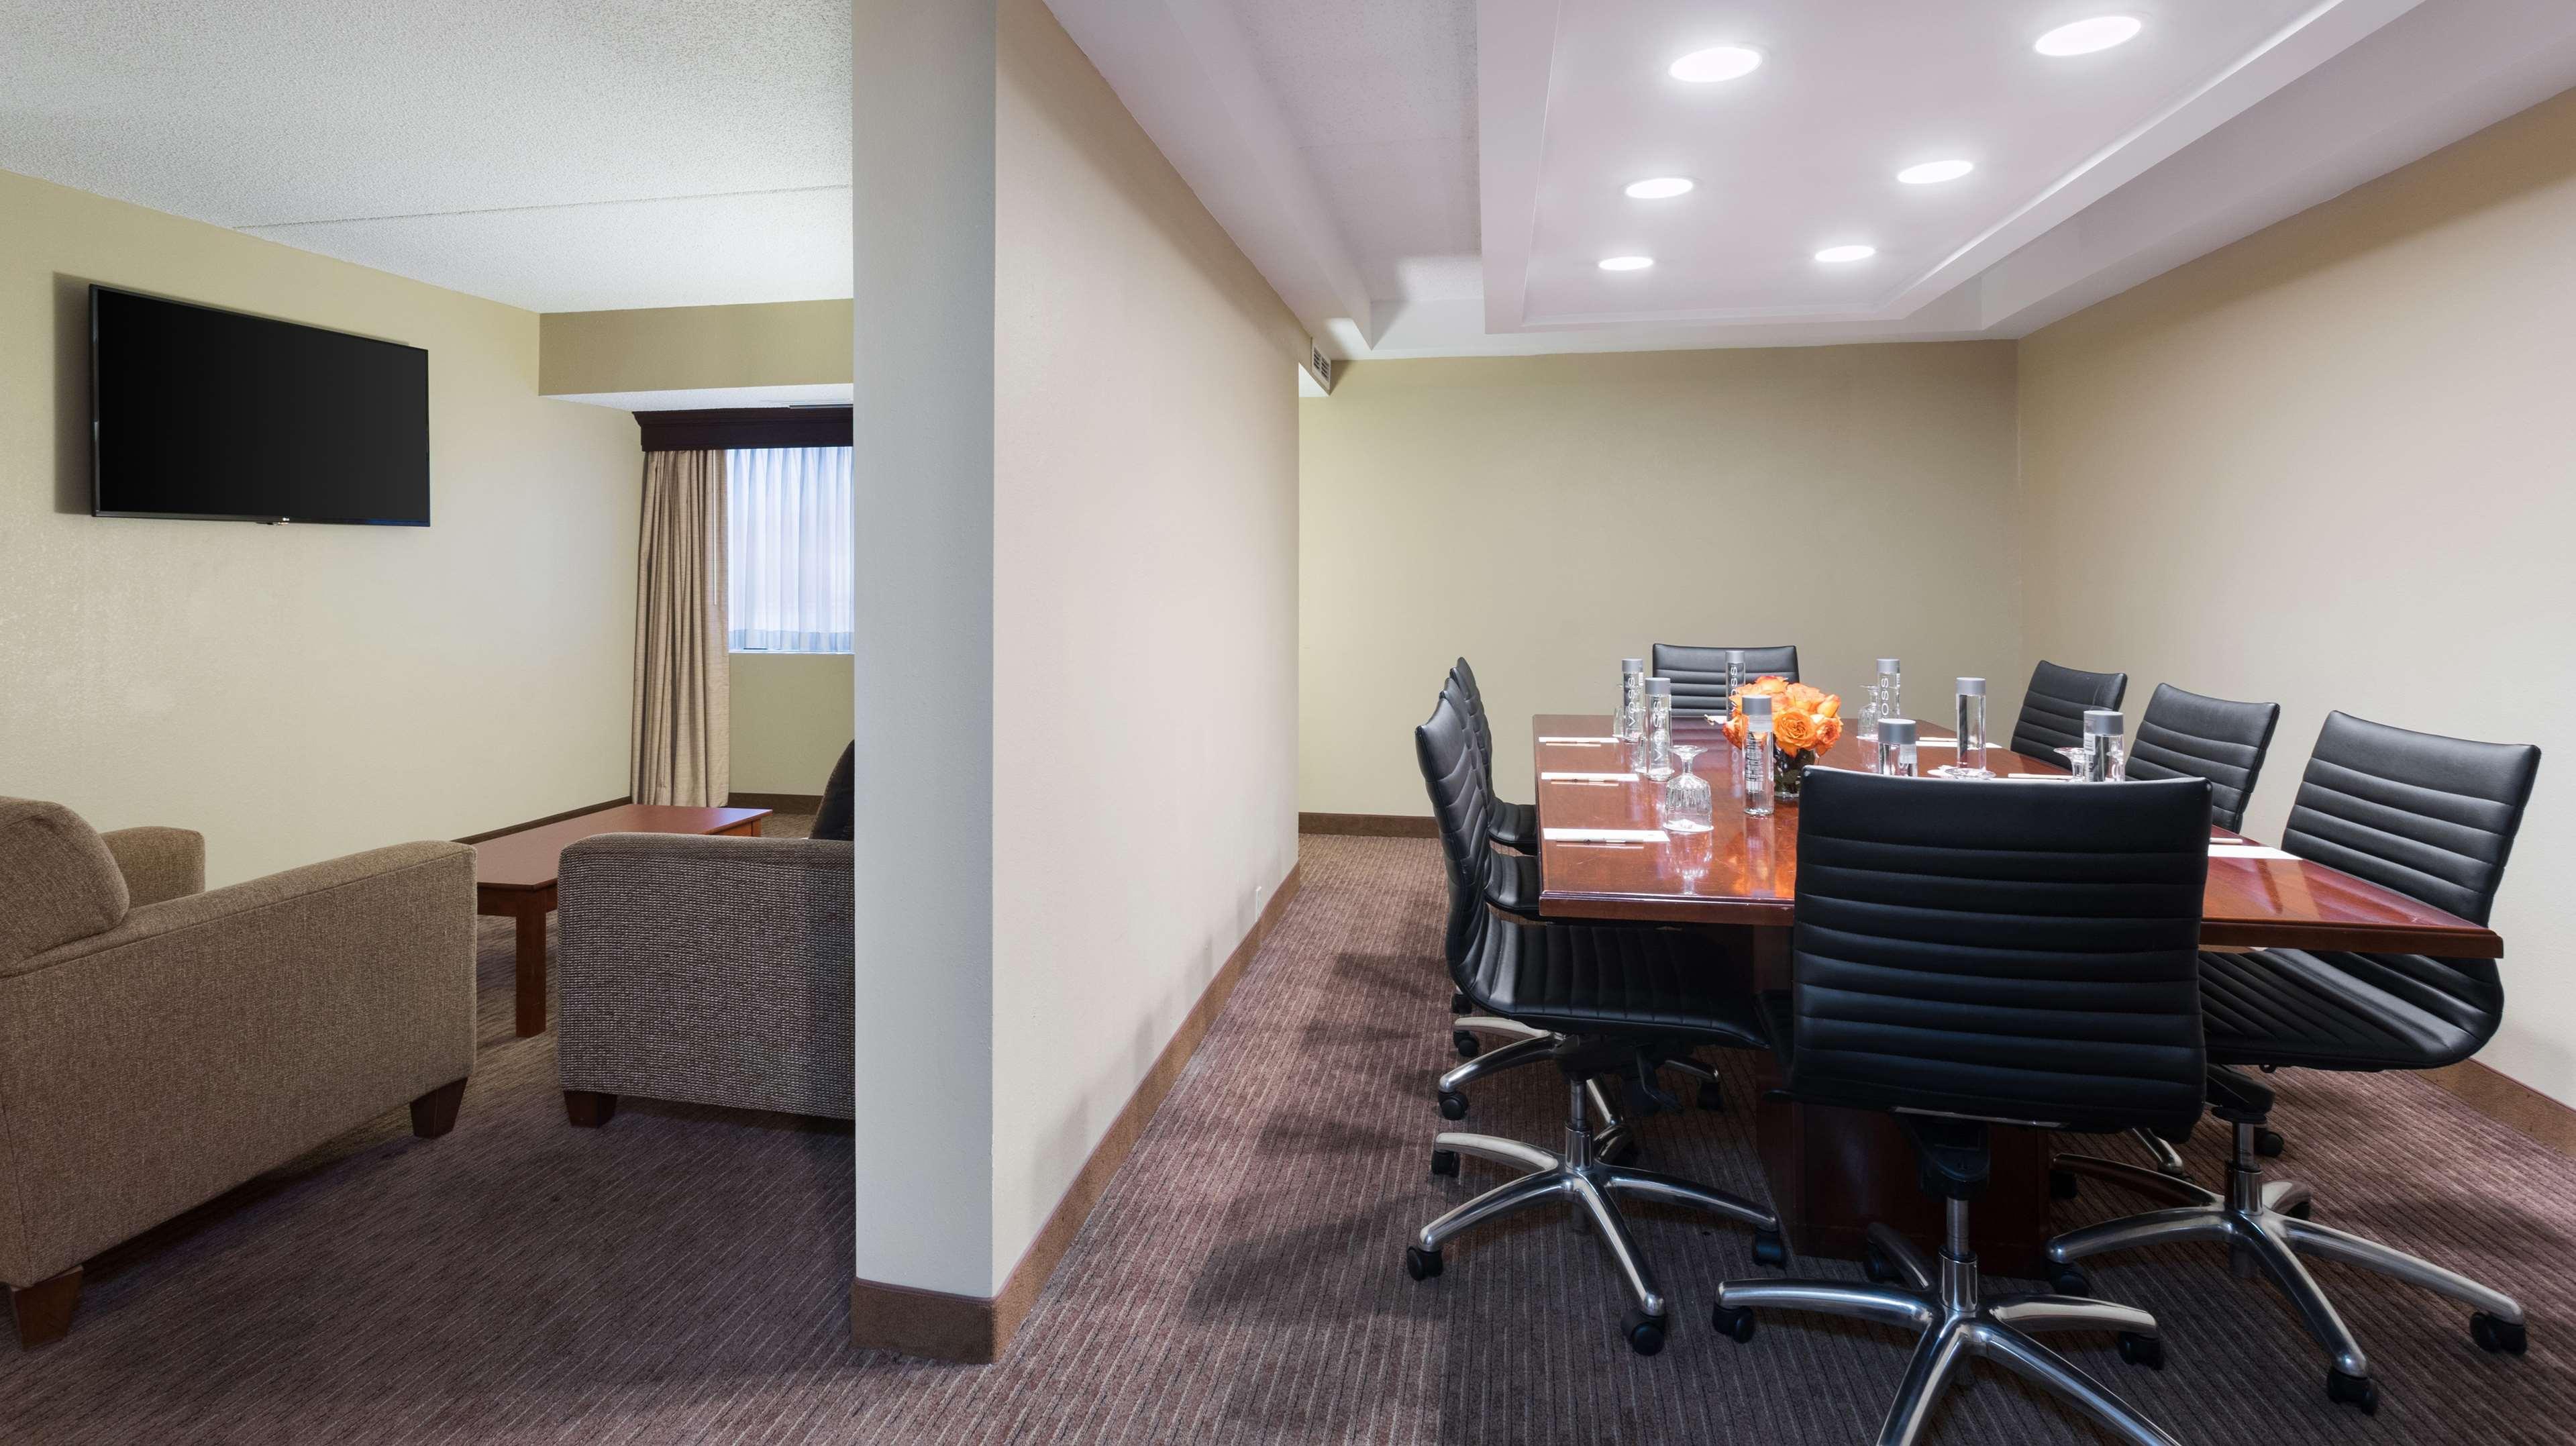 DoubleTree Suites by Hilton Hotel Cincinnati - Blue Ash image 26